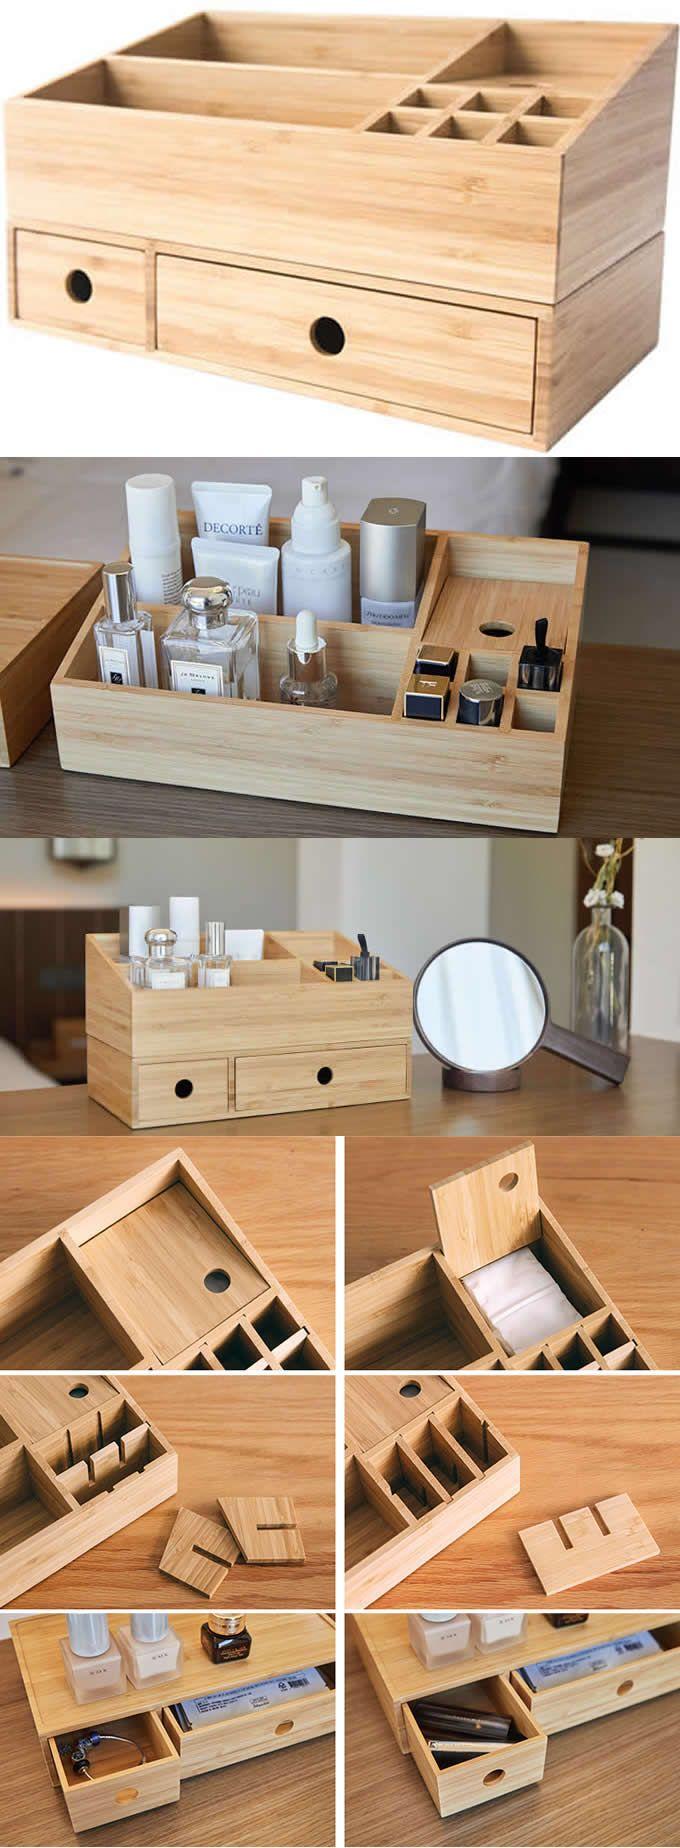 Bamboo Wooden Office Desk Orangizer 2 Drawer Makeup Storage